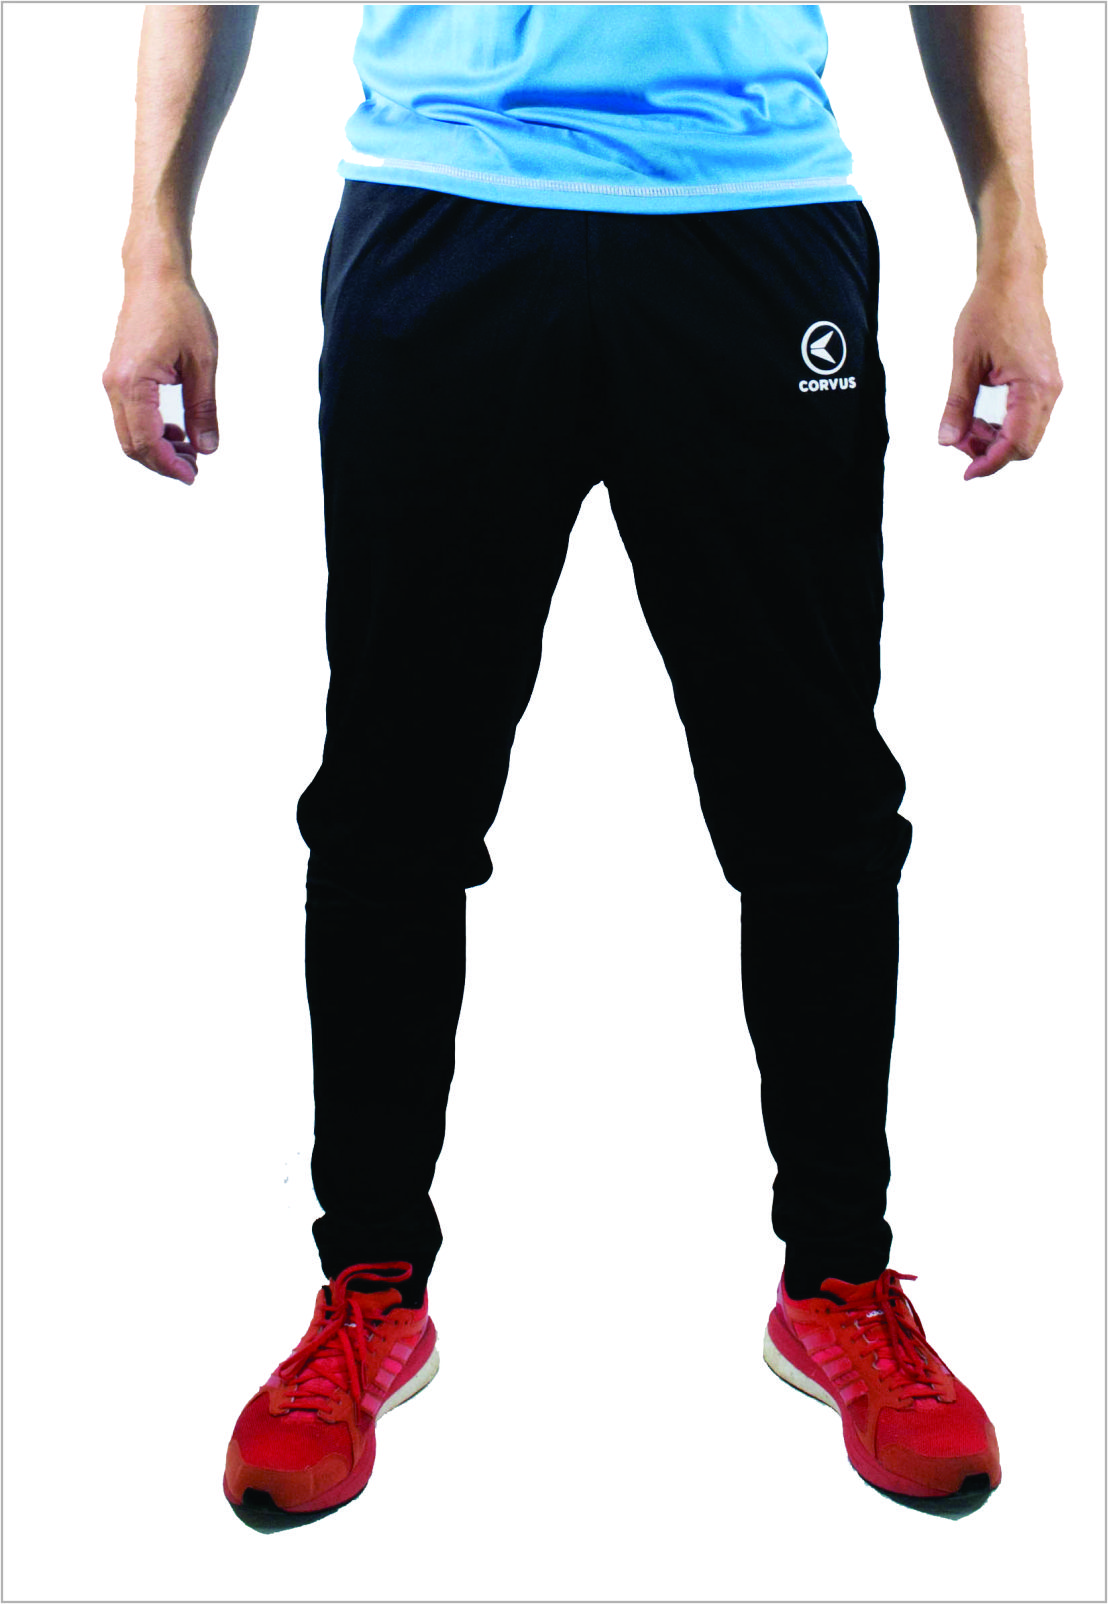 Inca  pantalones  largo  chupin  Corvus  Ropa  Deportiva Pantalón largo 379facb37325